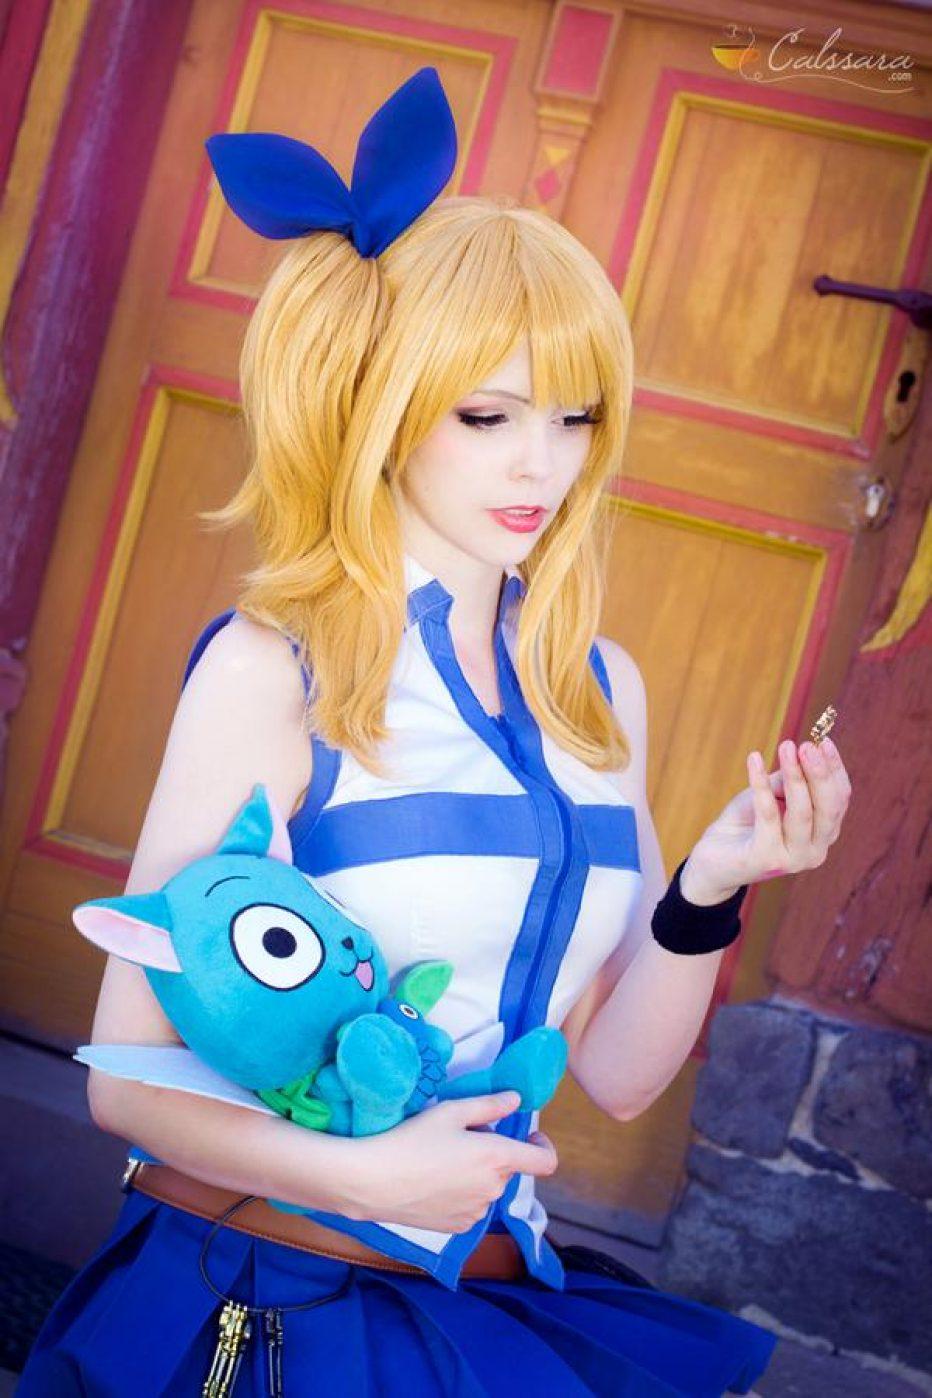 Fairy-Tail-Lucy-Heartfilia-Cosplay-Gamers-Heroes-3.jpg